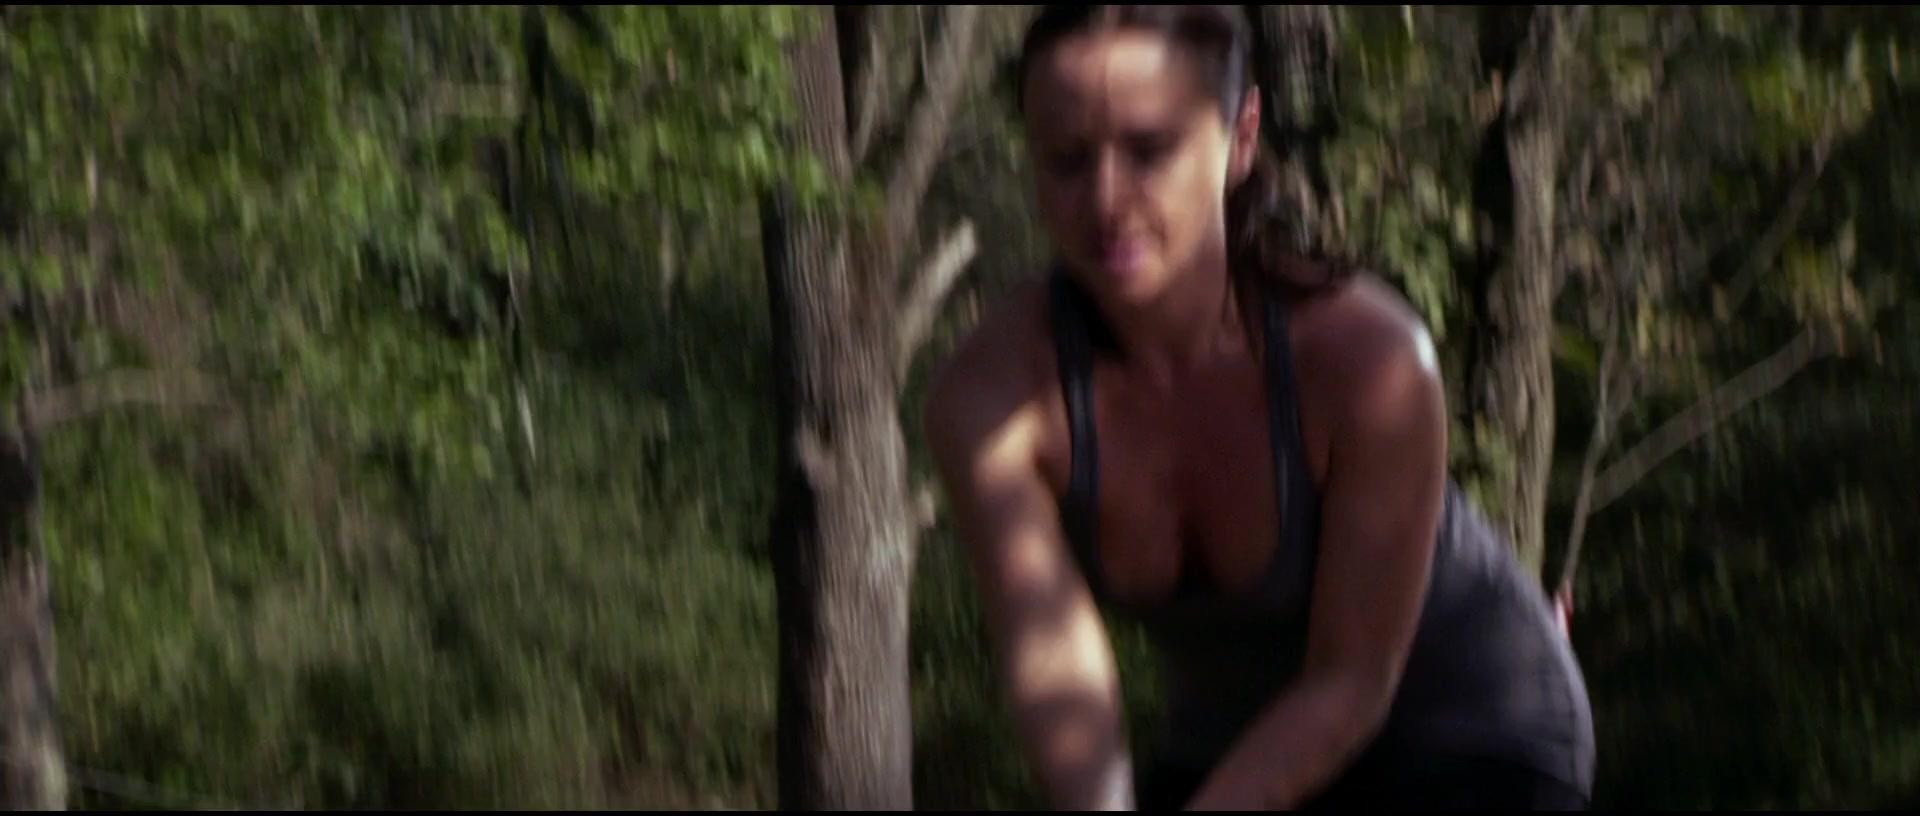 Harris nackt Danielle  Danielle harris